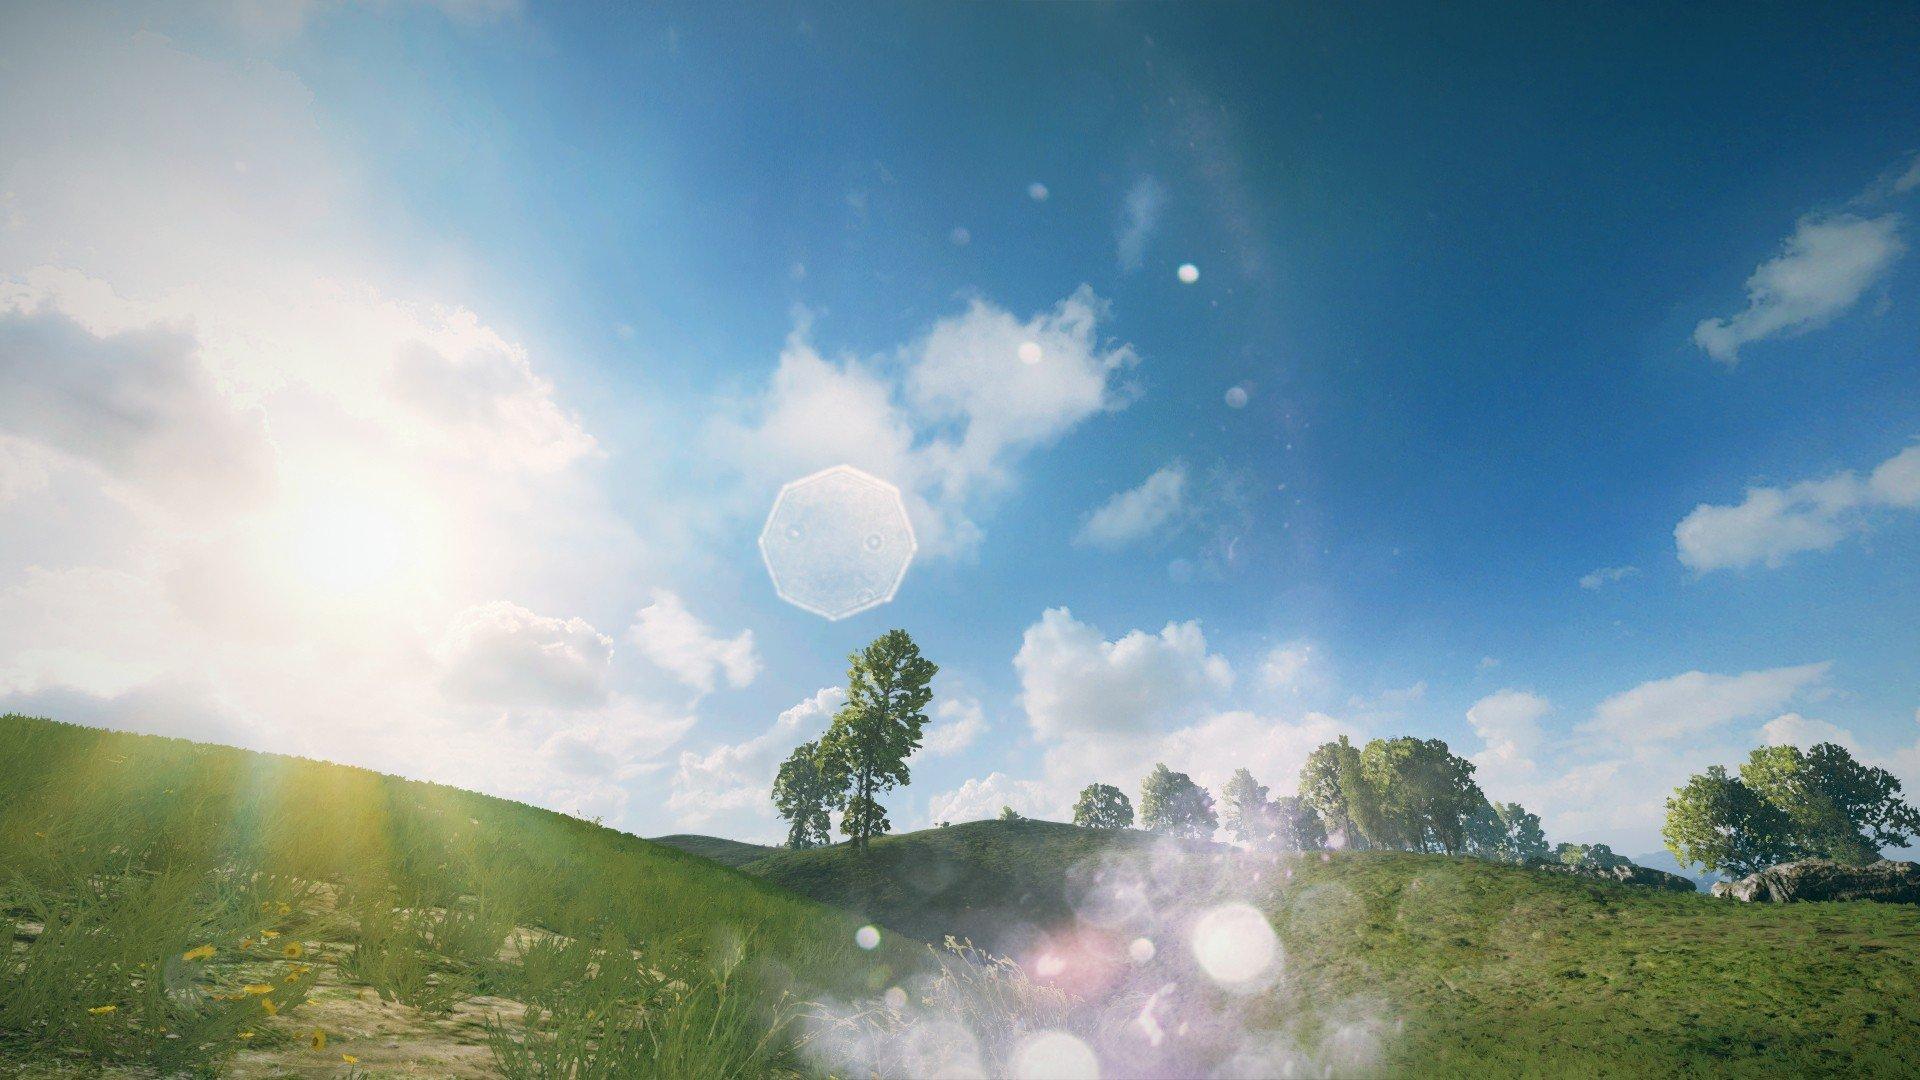 Nature Battlefield 3 Caspian Border Skies Wallpaper